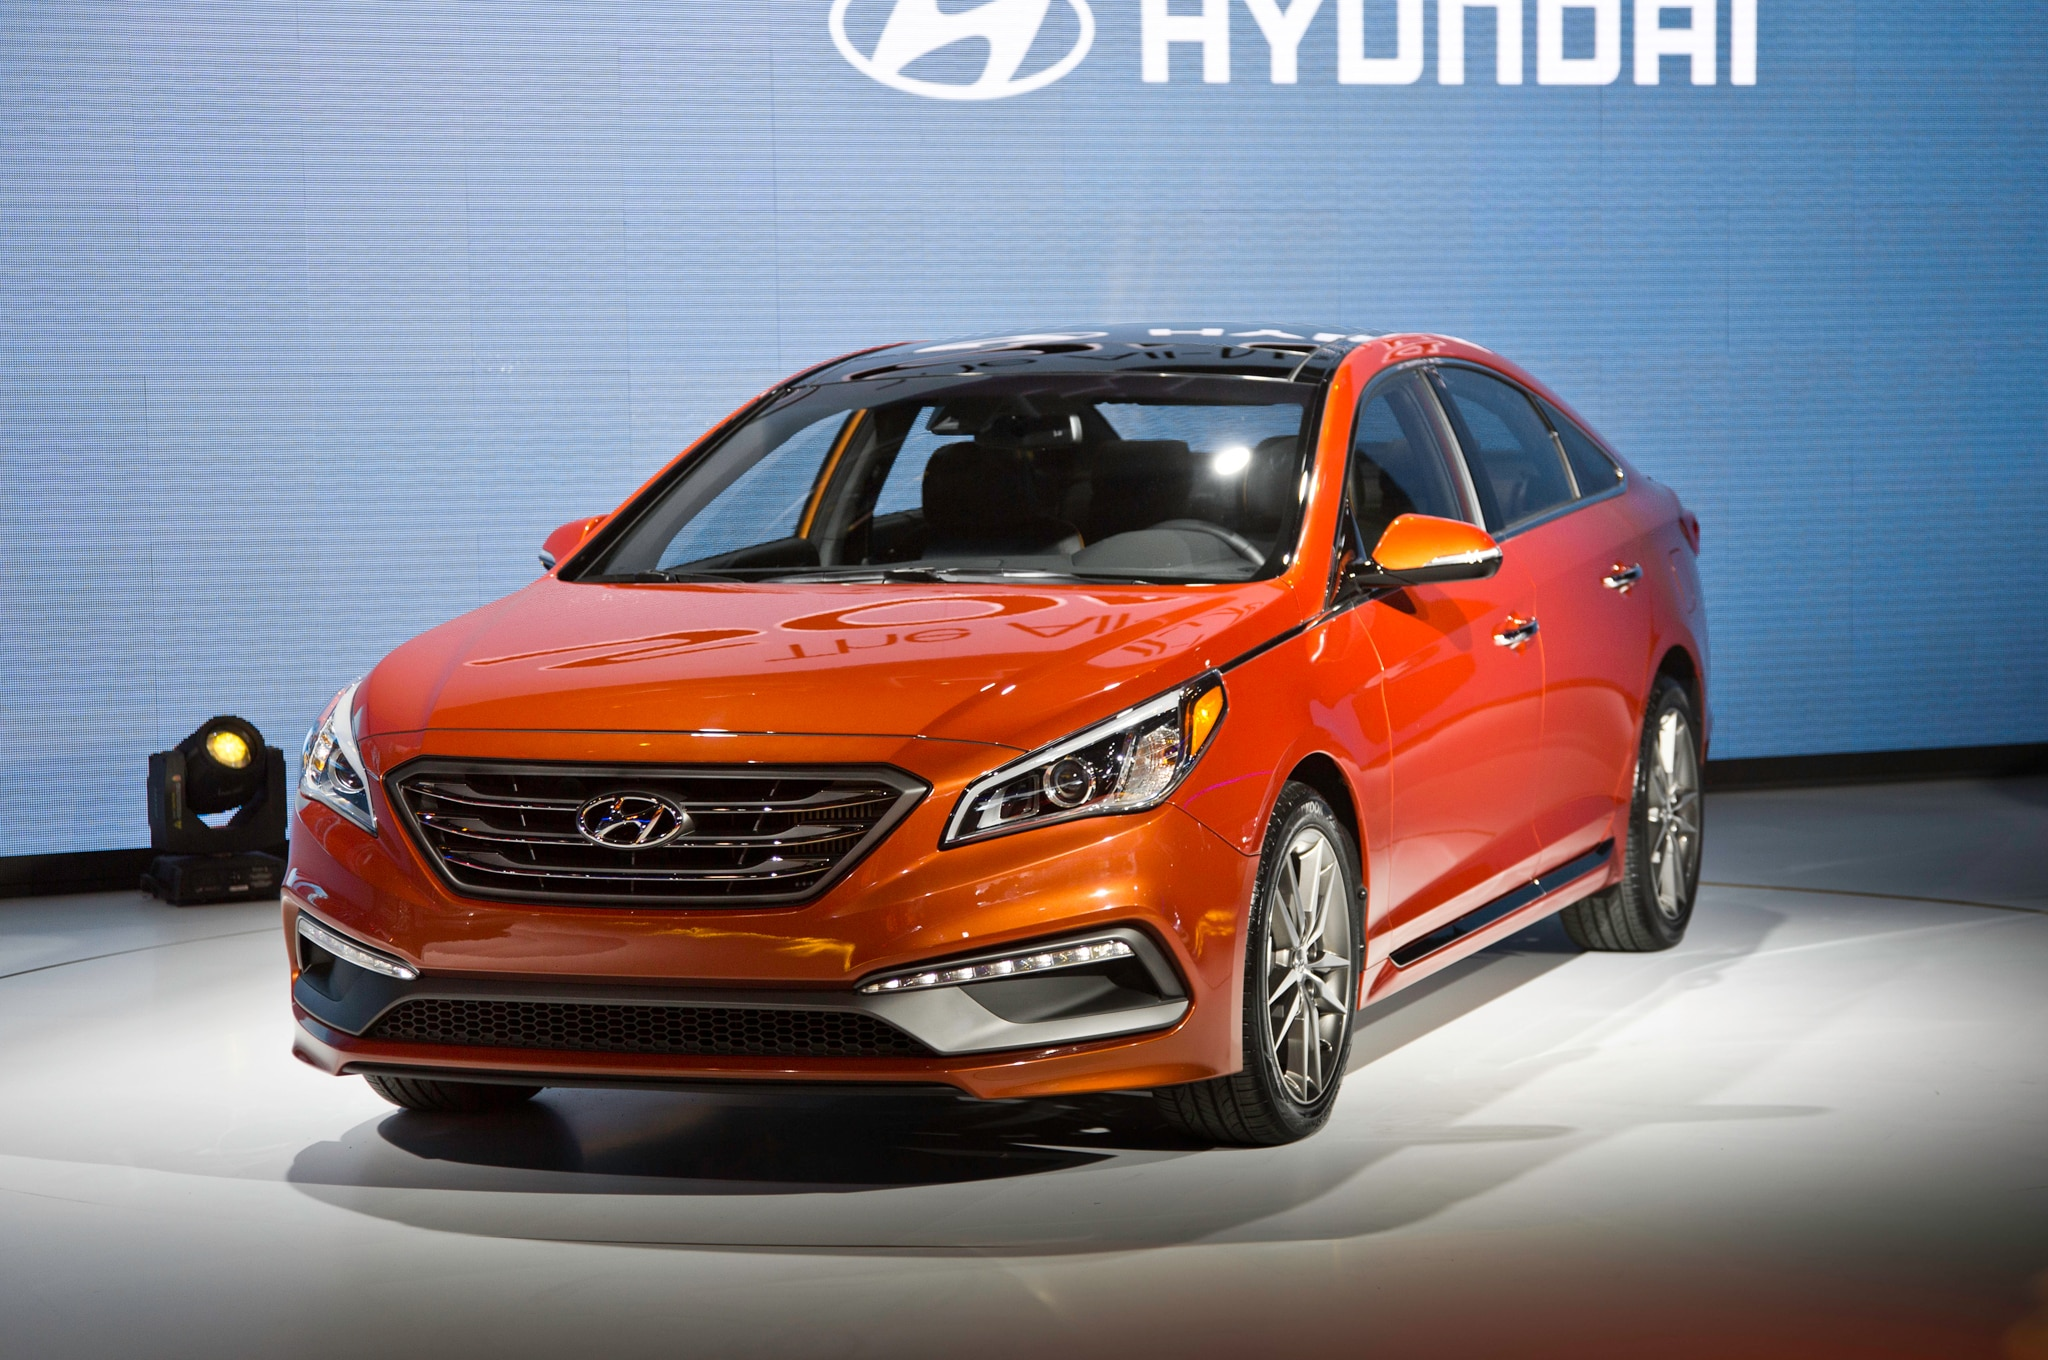 2015 Hyundai Sonata Sport 20T Front Three Quarters 021